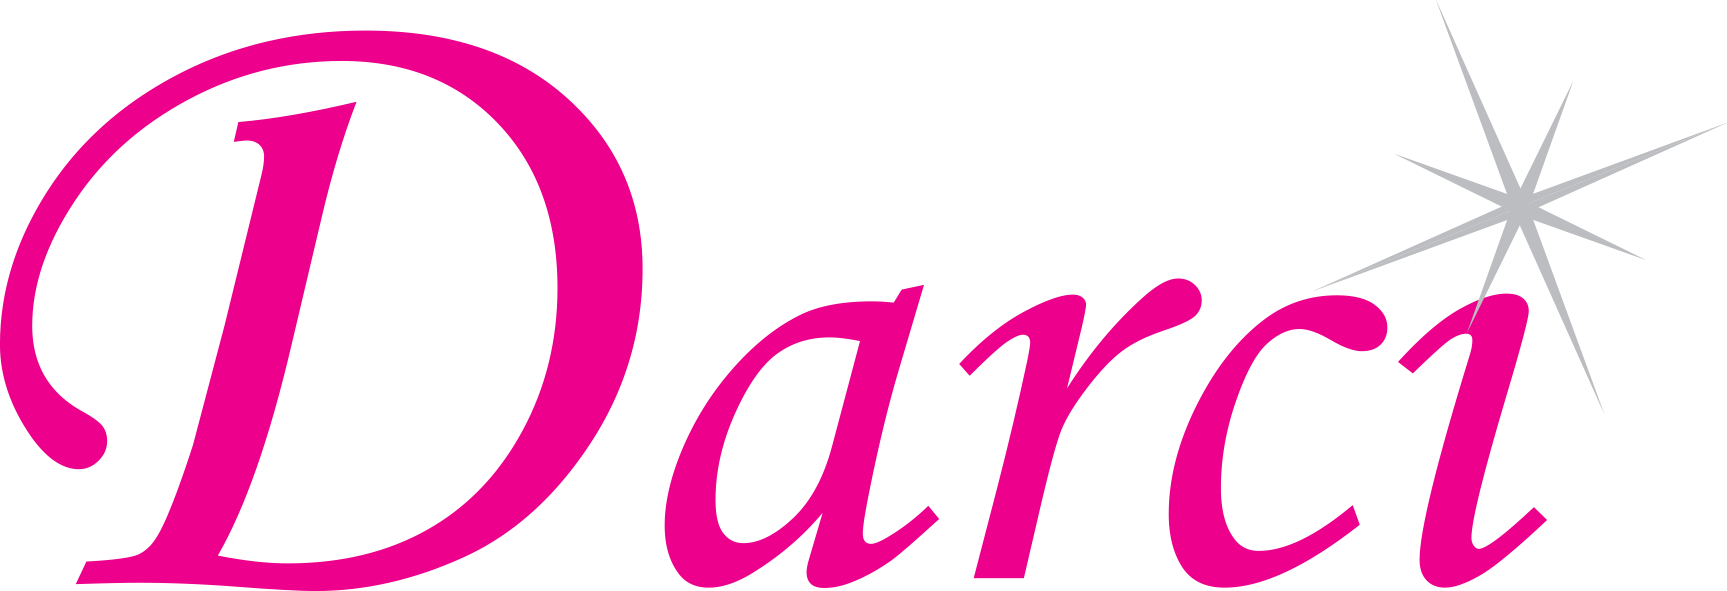 Shop Darci